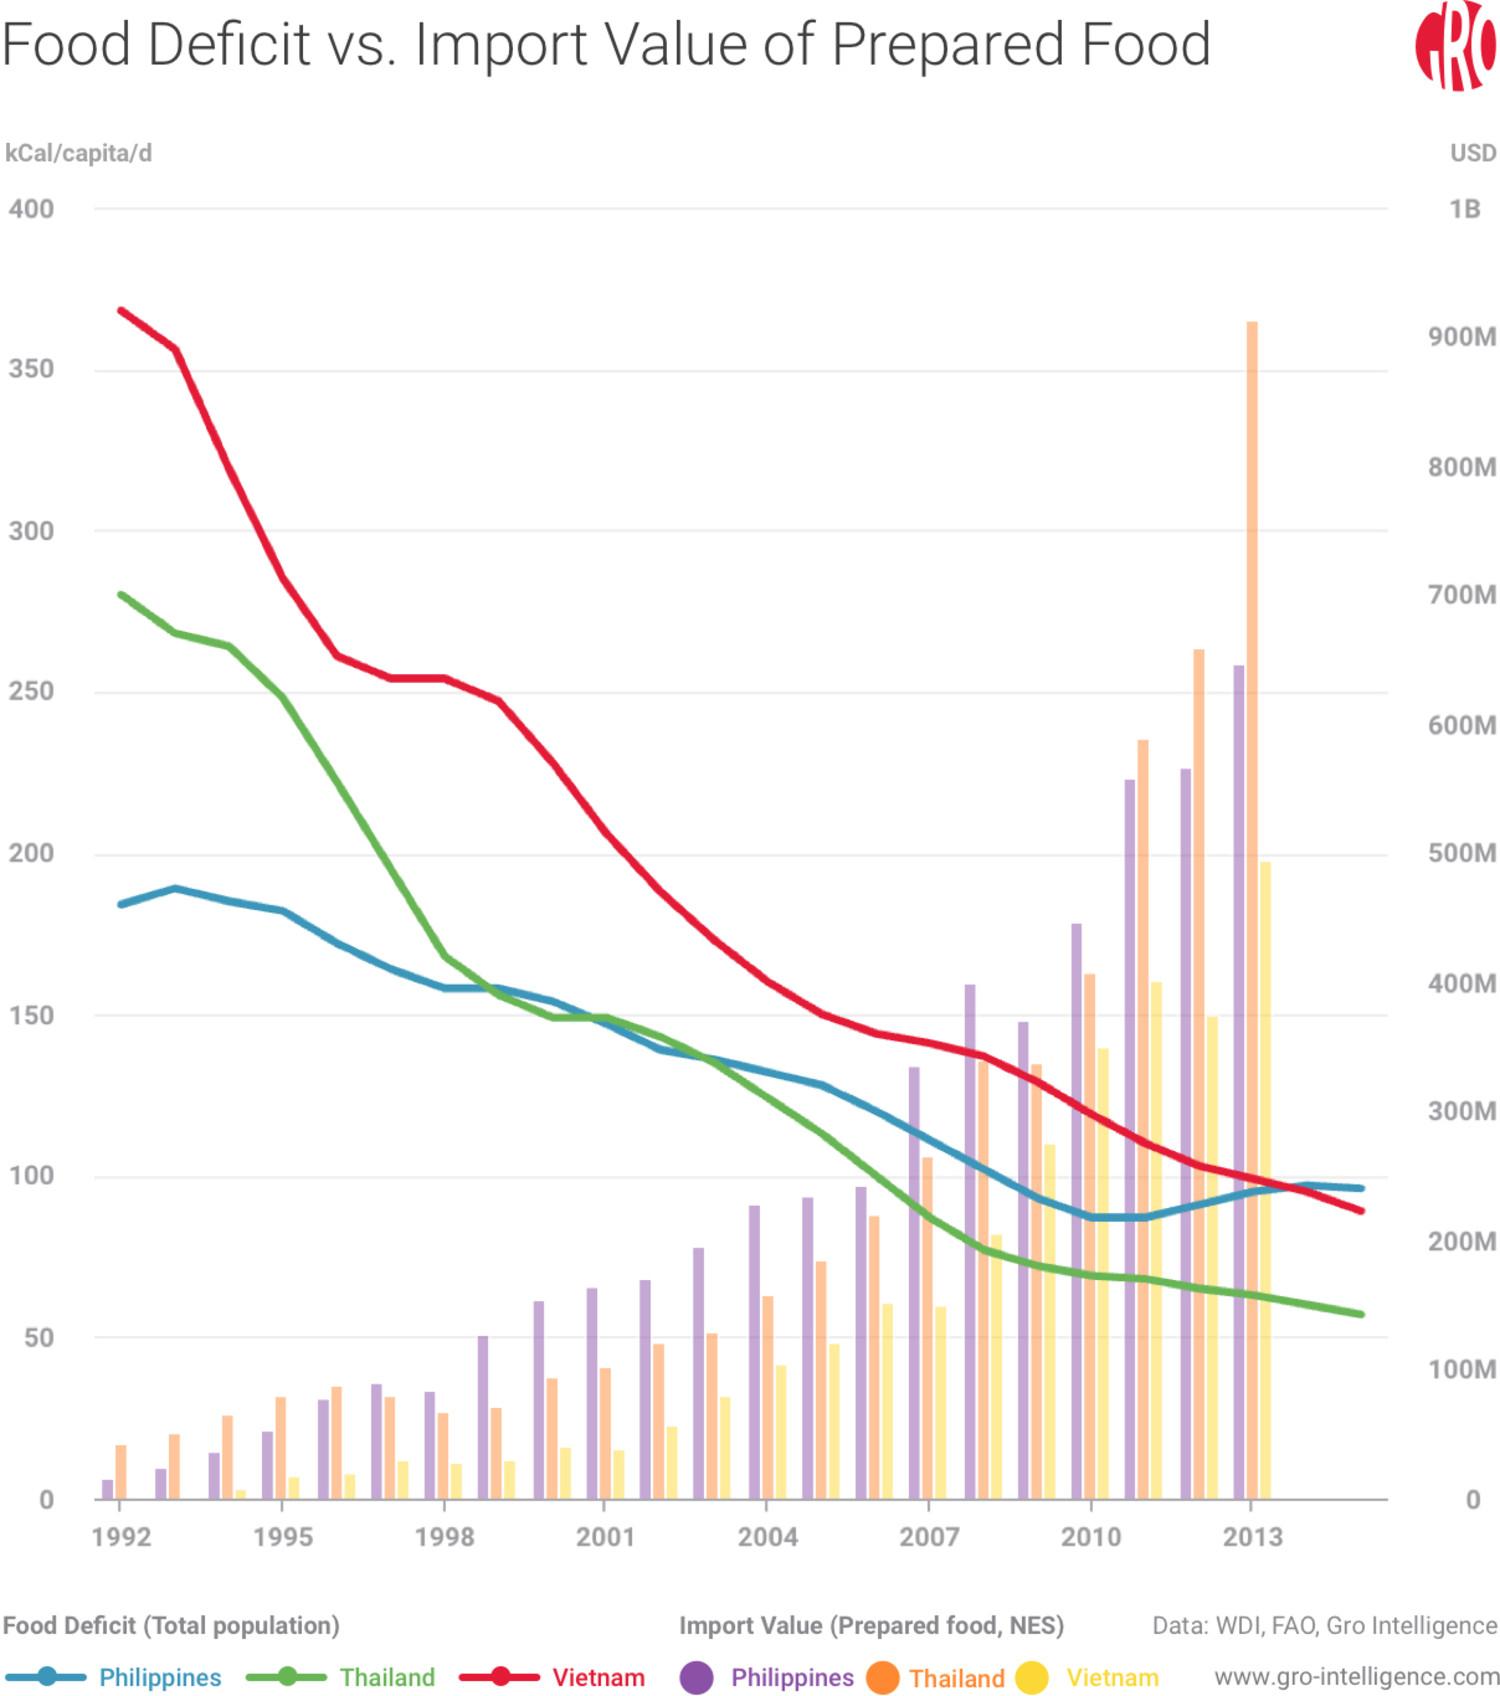 Food Deficit vs. Import Value of Prepared Food